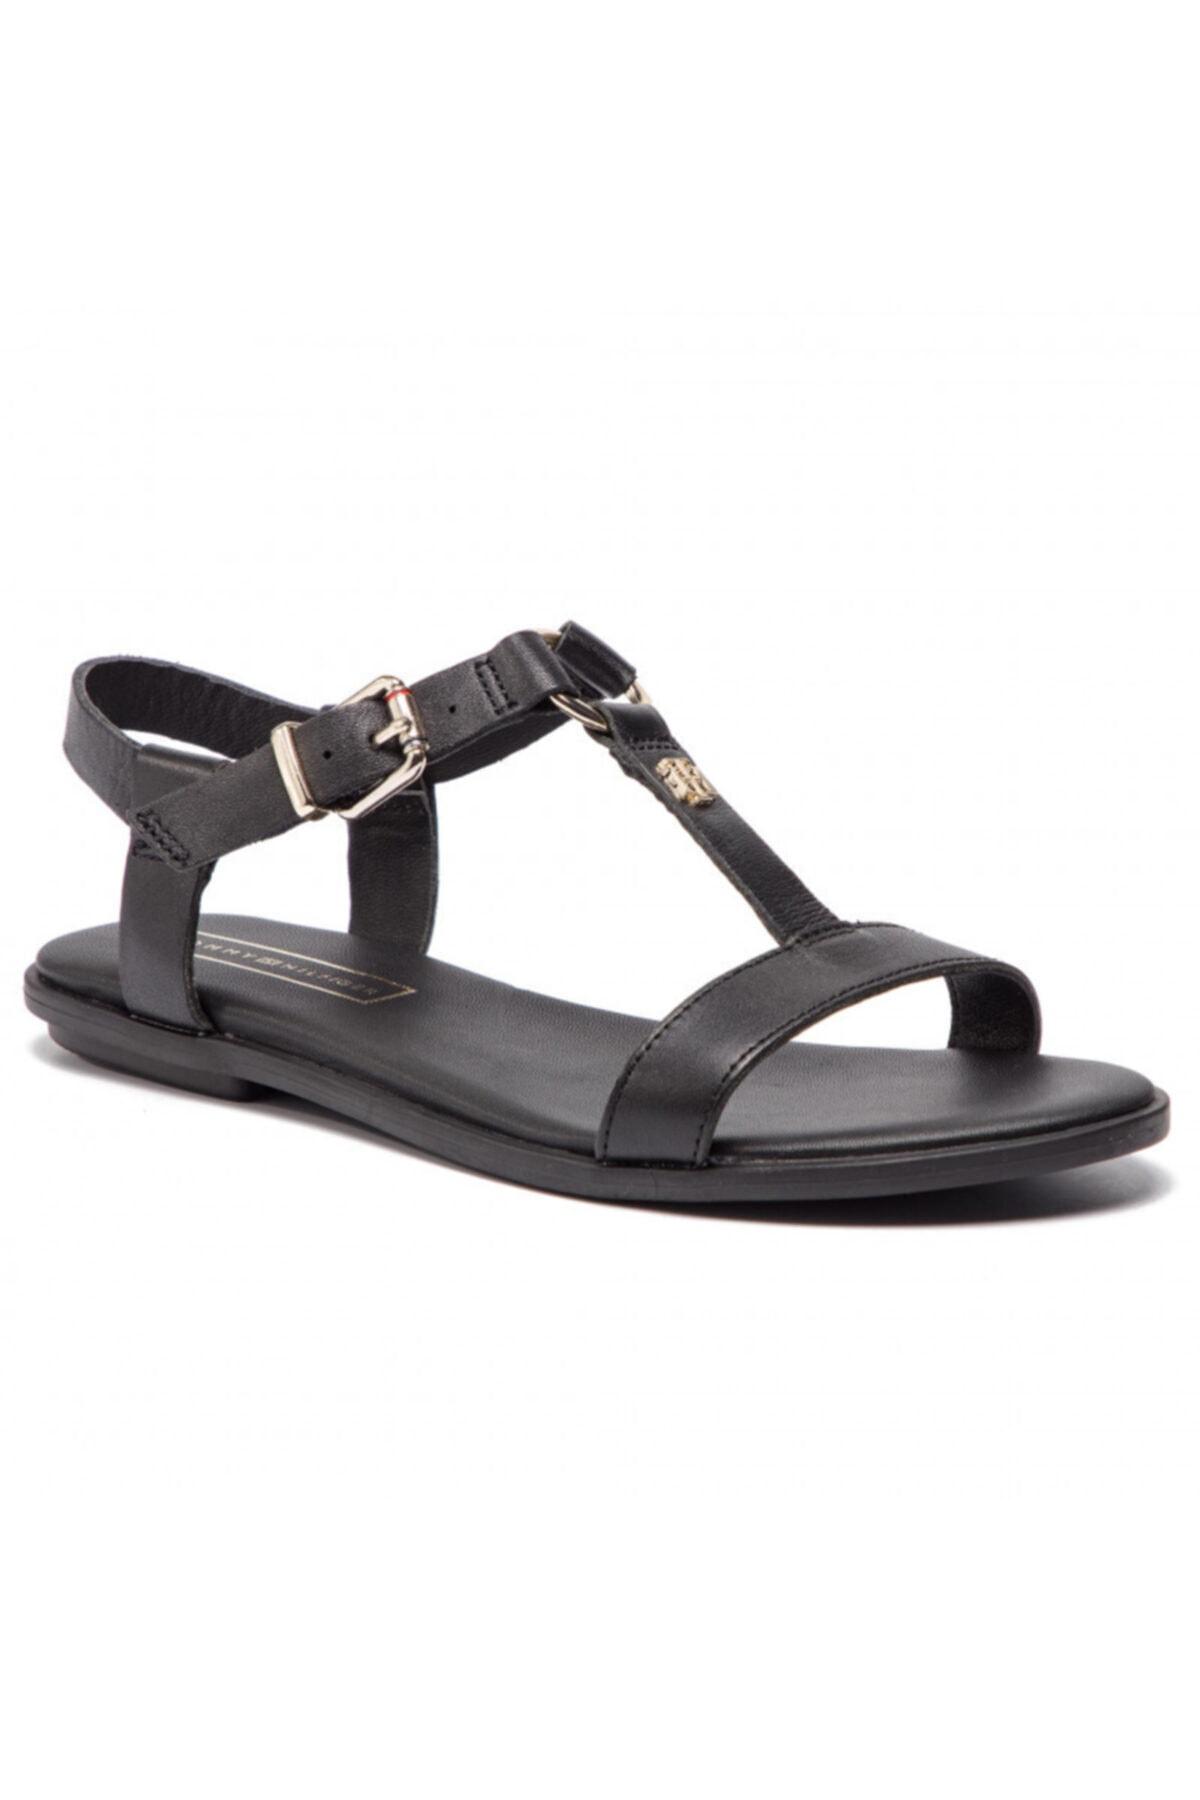 Tommy Hilfiger Kadın Deri Sandalet Fw0fw03946 1